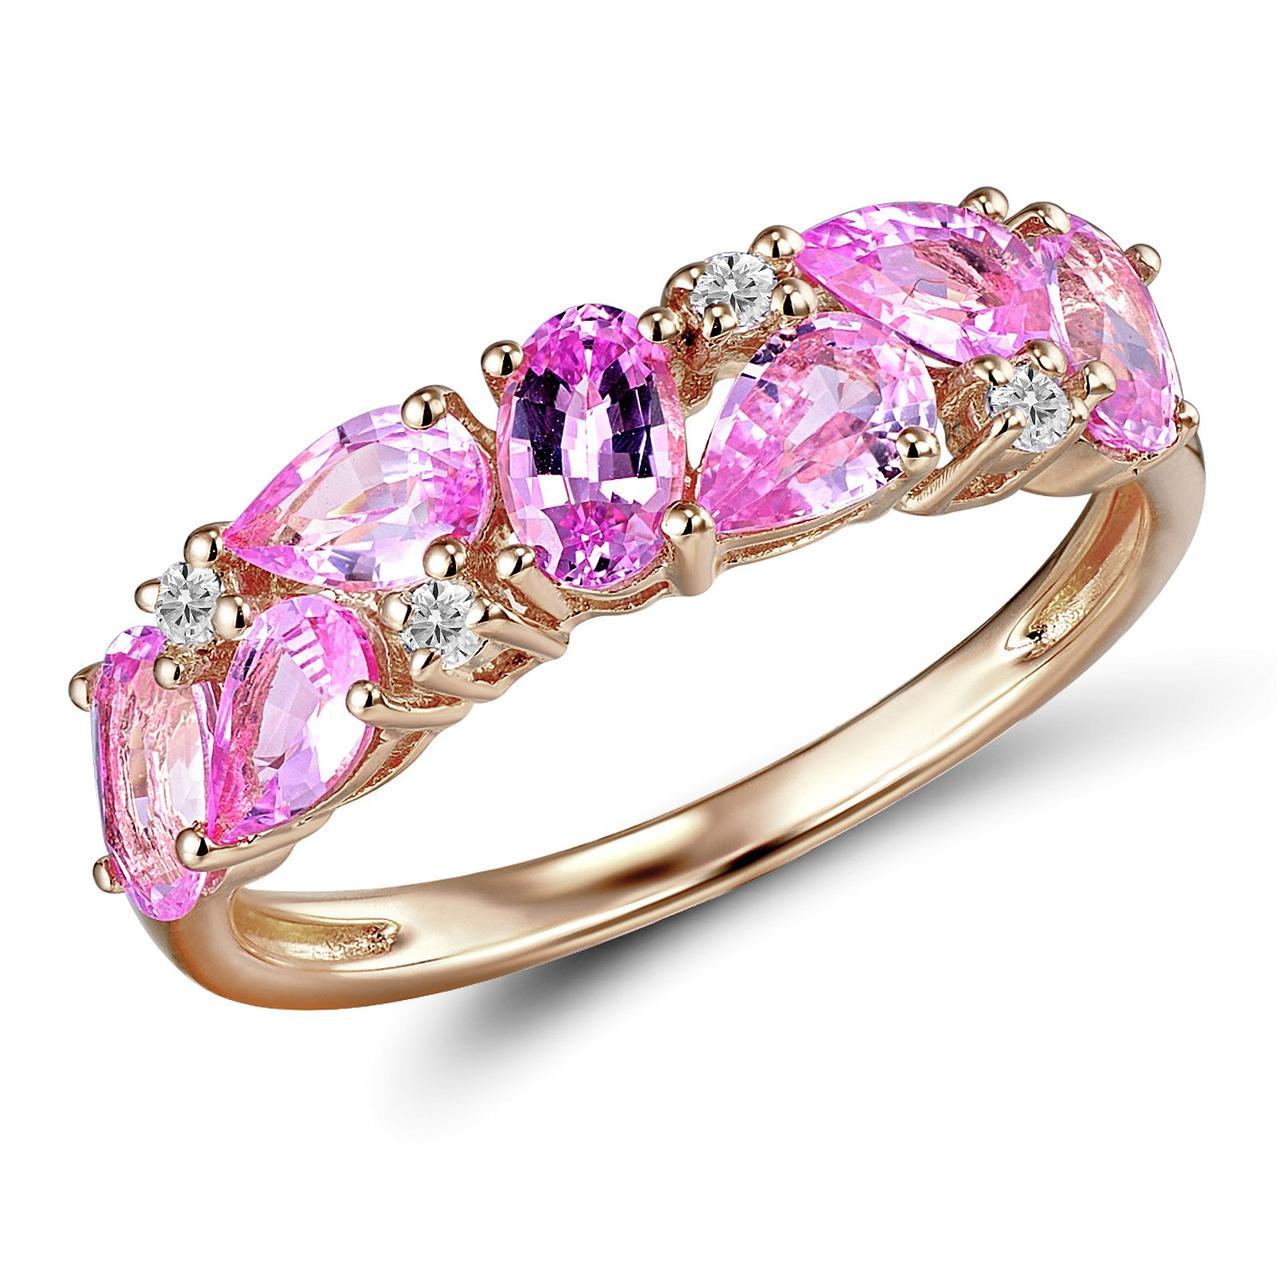 Золотое кольцо с бриллиантами и сапфирами, размер 16 (1603752)